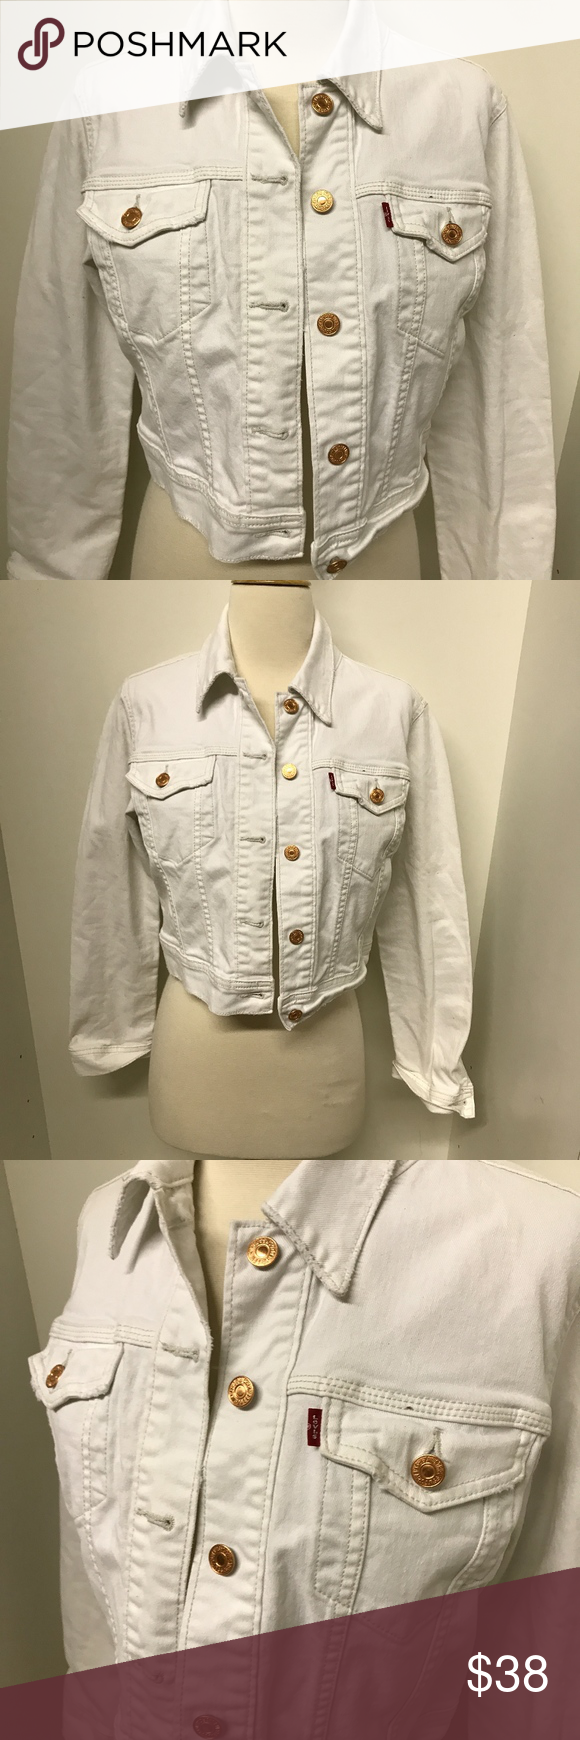 Levi S White Crop Jean Jacket Rose Gold Buttons Cropped White Jeans Crop Jean Jacket Jean Jacket [ 1740 x 580 Pixel ]